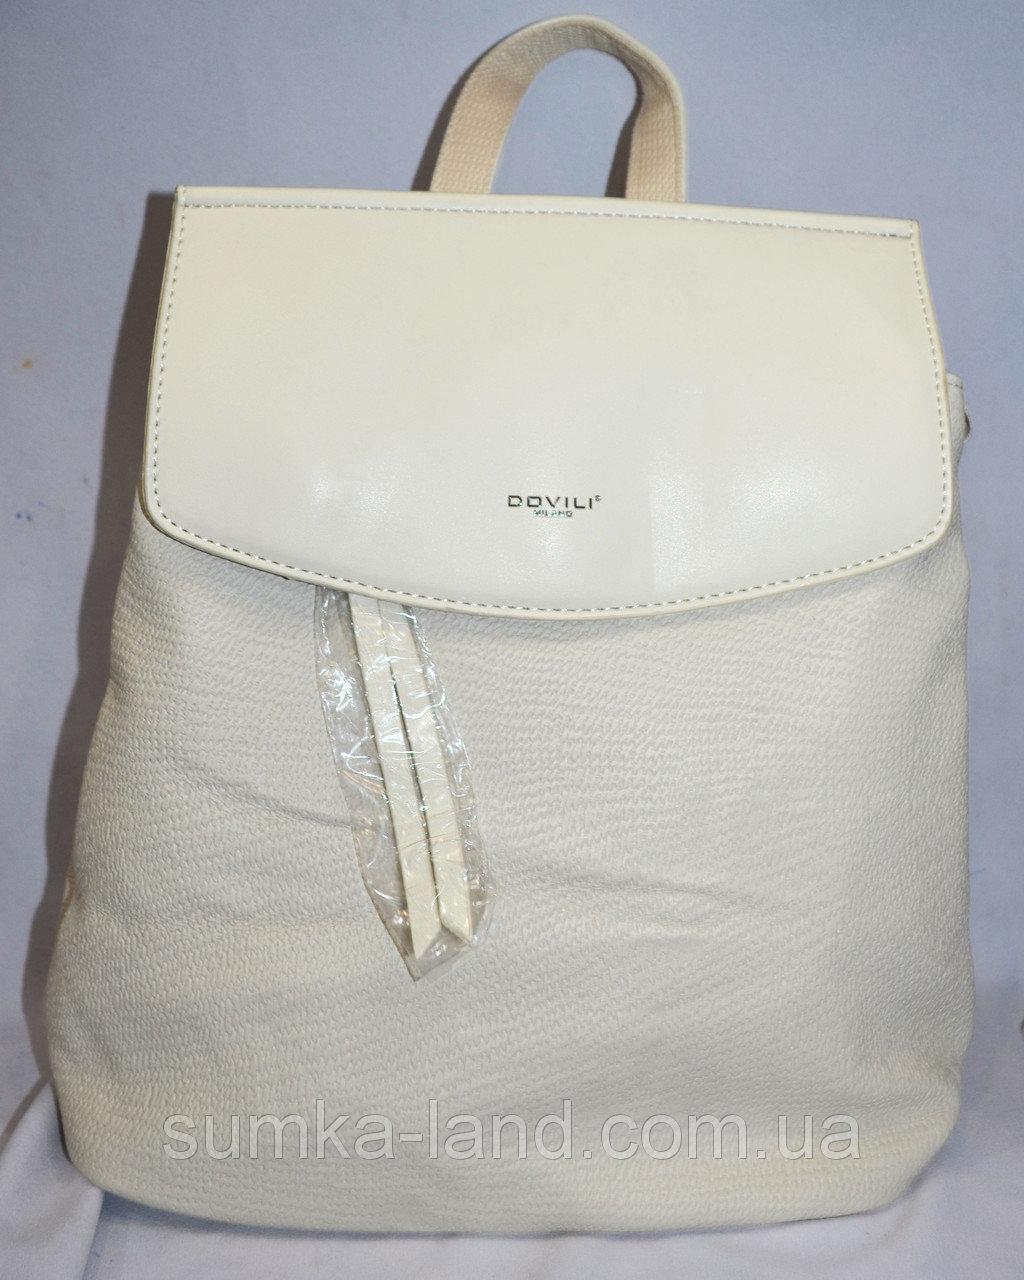 05b7f4364e25 Крутой женский рюкзак сумка брендовый DOVILI. Бежевый - Интернет-магазин  Ruykzachok в Харькове